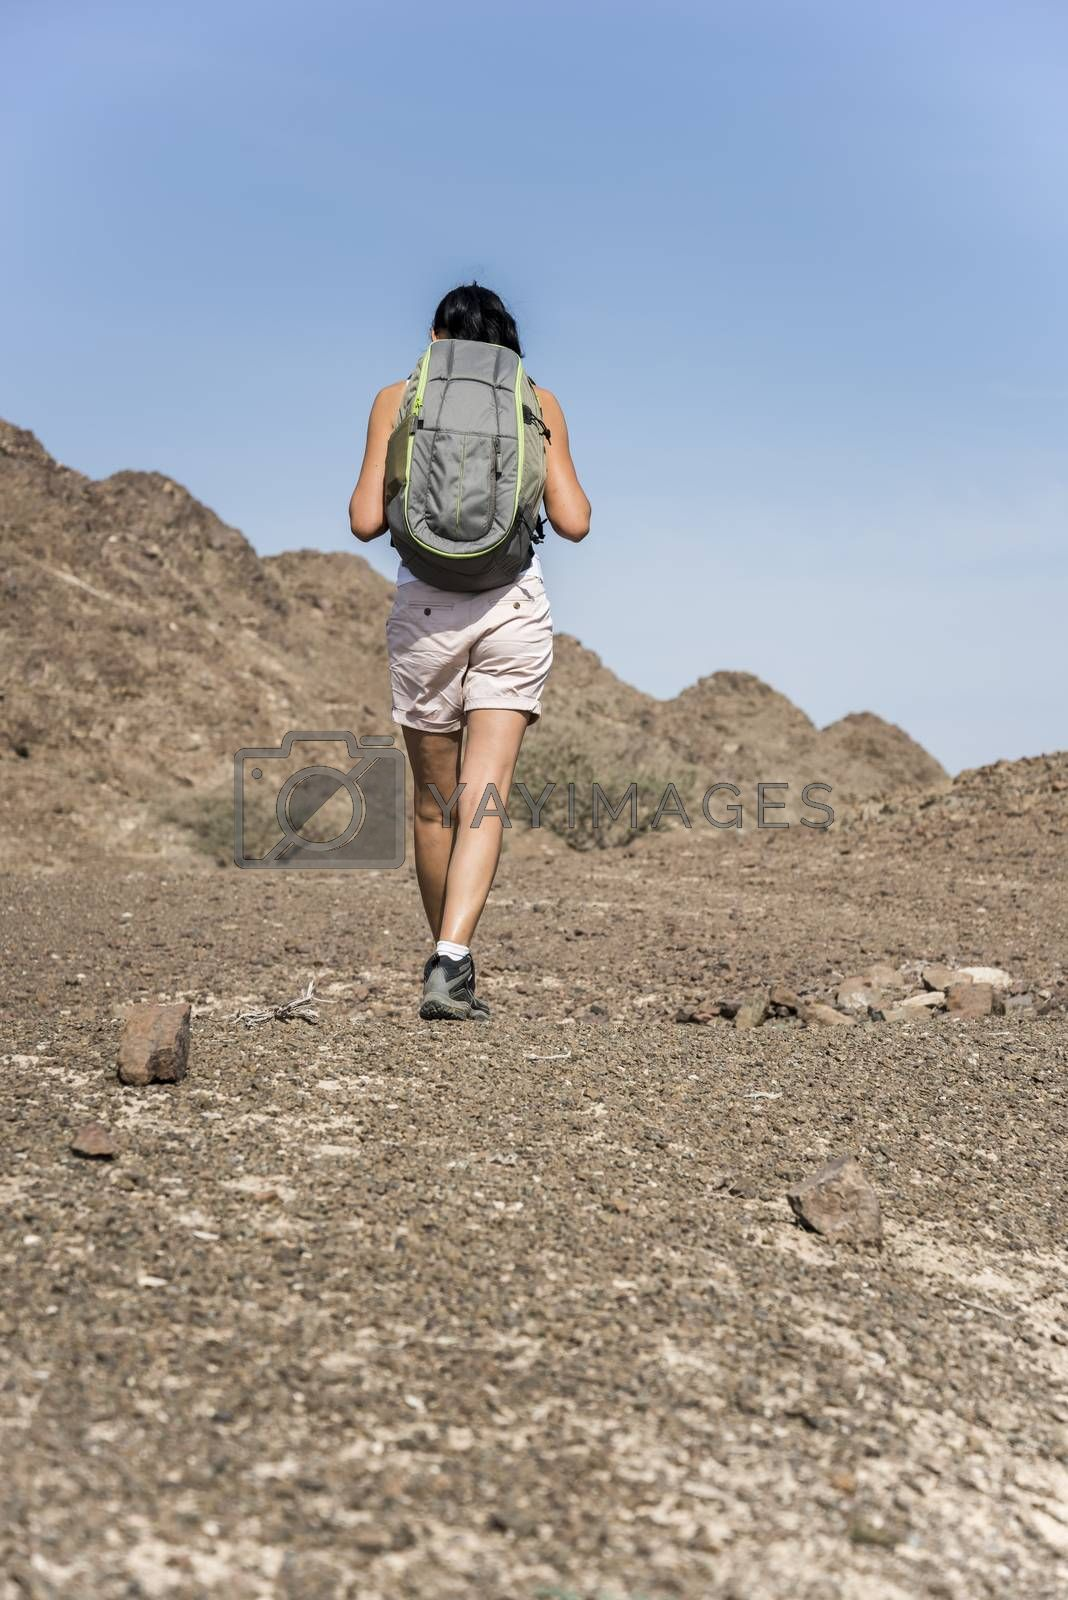 Woman trekking in a Wadi (Dry mountains) of Showka, RAK, UAE by GABIS